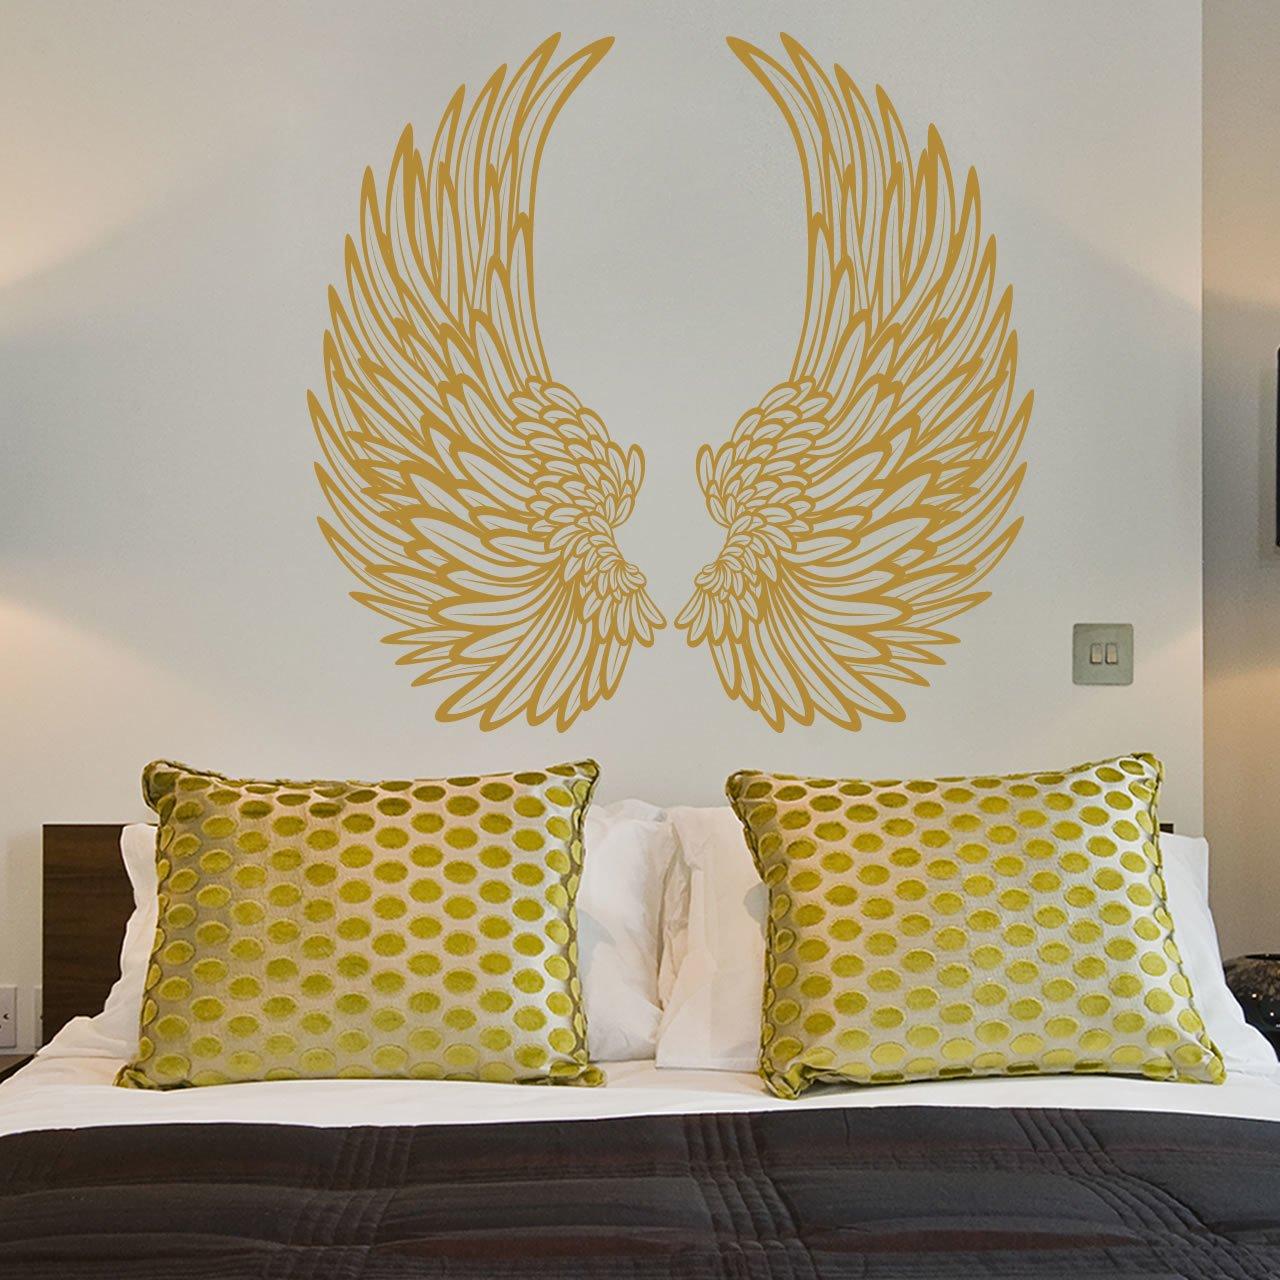 Decorative Angel Wings Wall Sticker - World of Wall Stickers